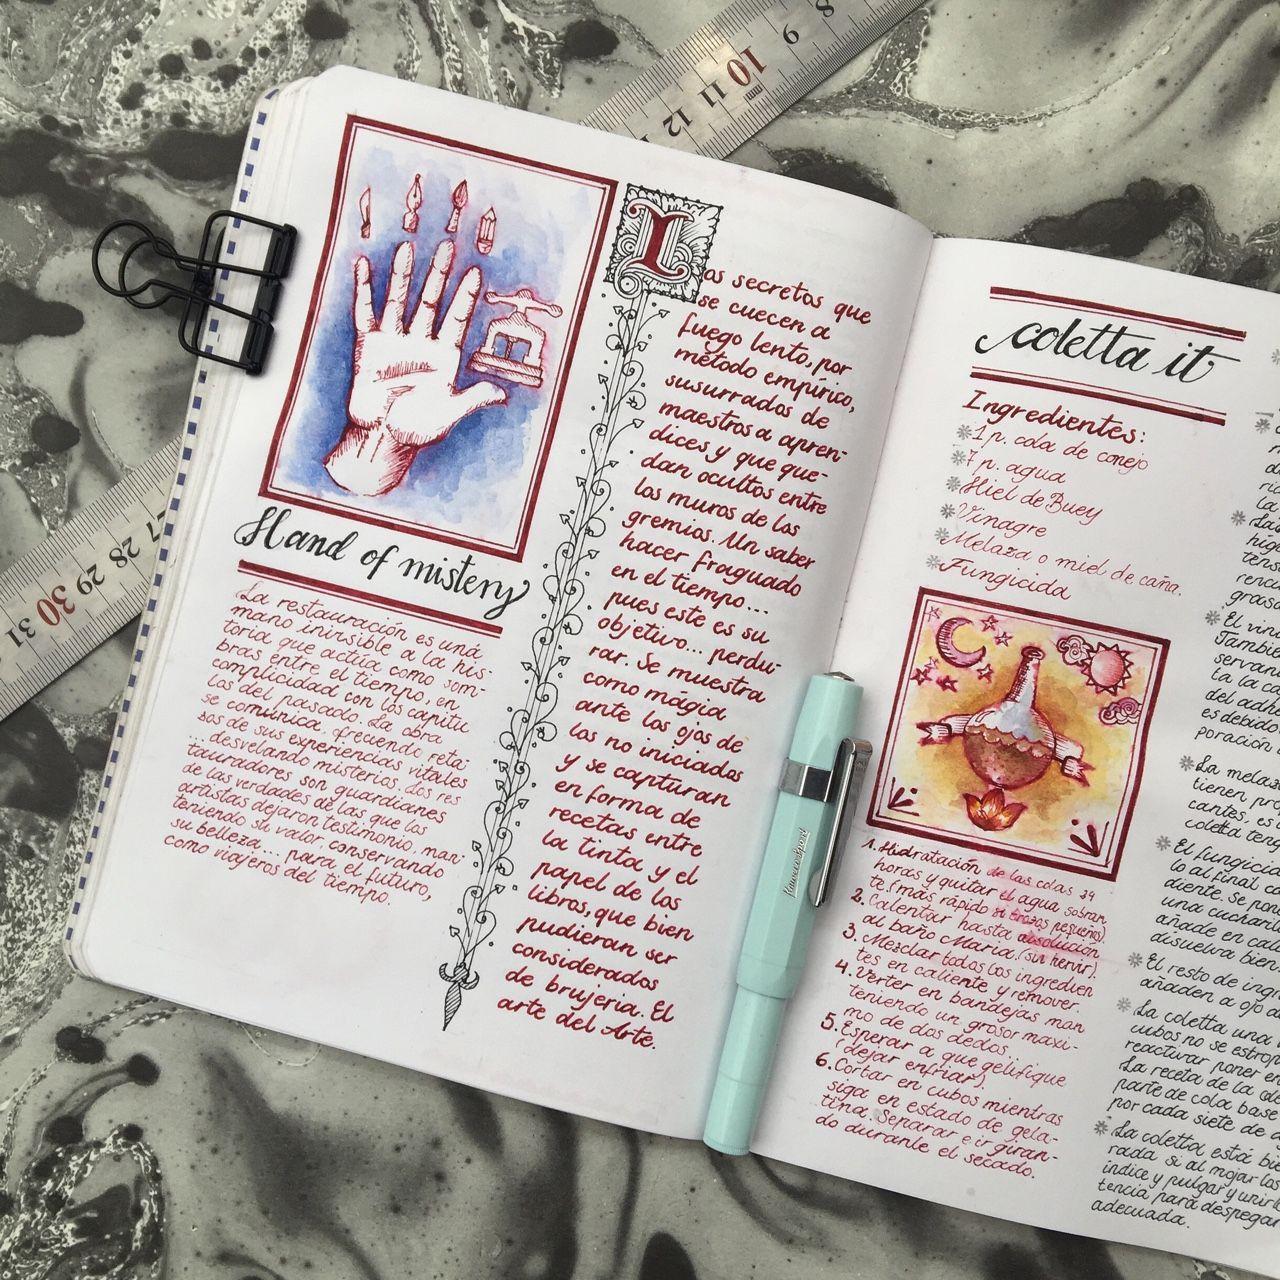 Lacreativista La Creativista Art Journaling And Bookbinding Art Journal Journal Bullet Journal Inspiration